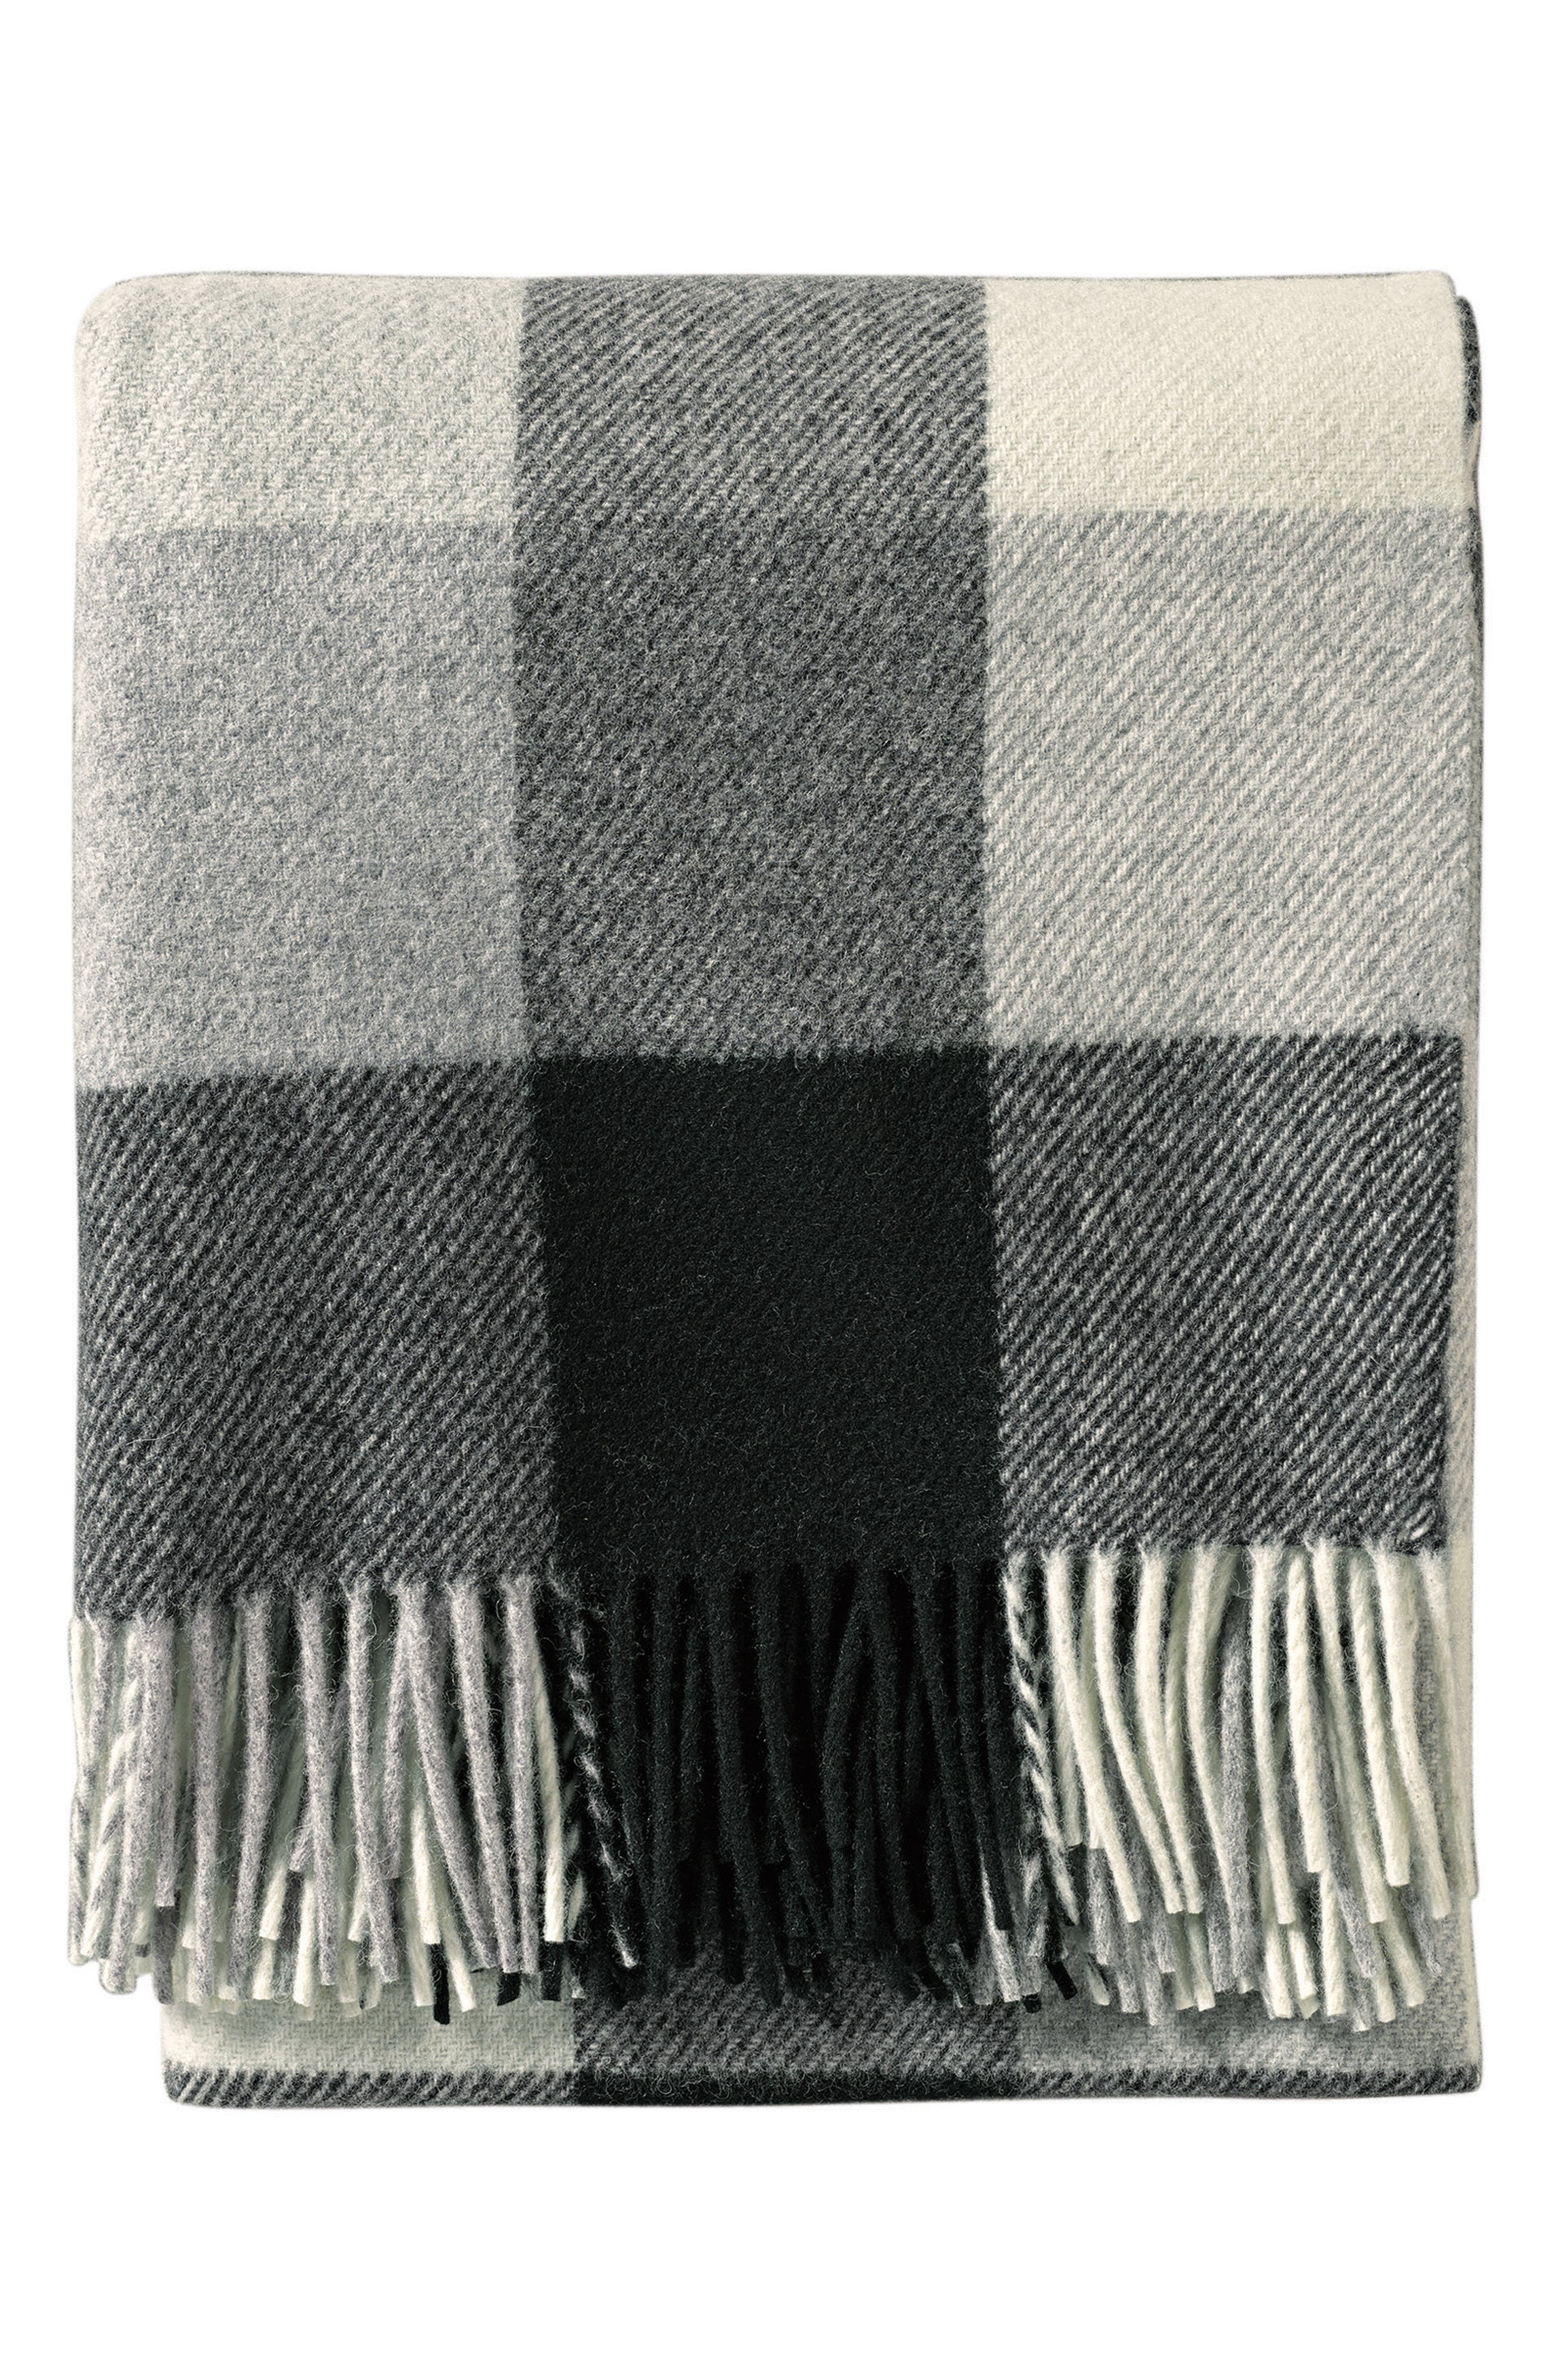 Plaid Washable Wool Throw,                             Main thumbnail 1, color,                             BLACK/ IVORY